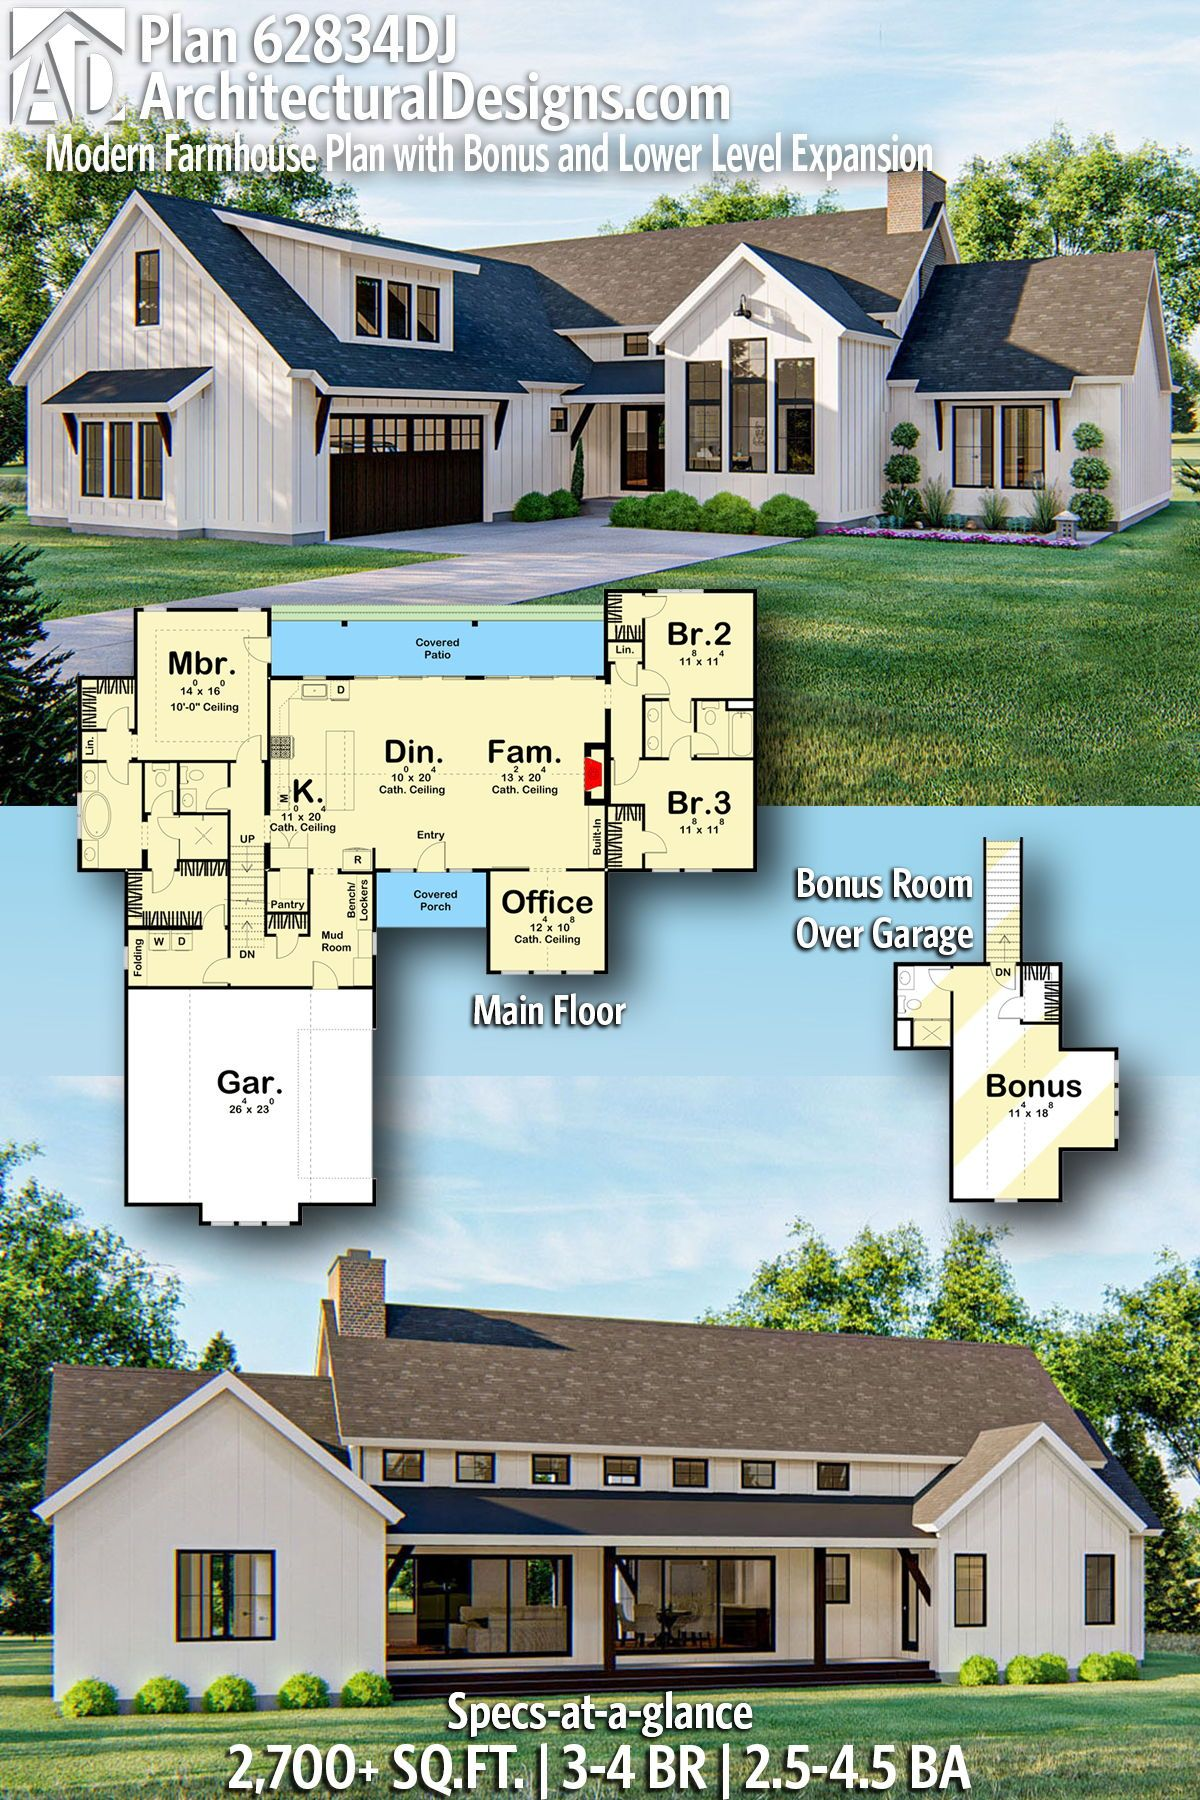 Plan 62834dj Modern Farmhouse Plan With Bonus And Lower Level Expansion In 2020 House Plans Farmhouse Modern Farmhouse Plans Farmhouse Plans